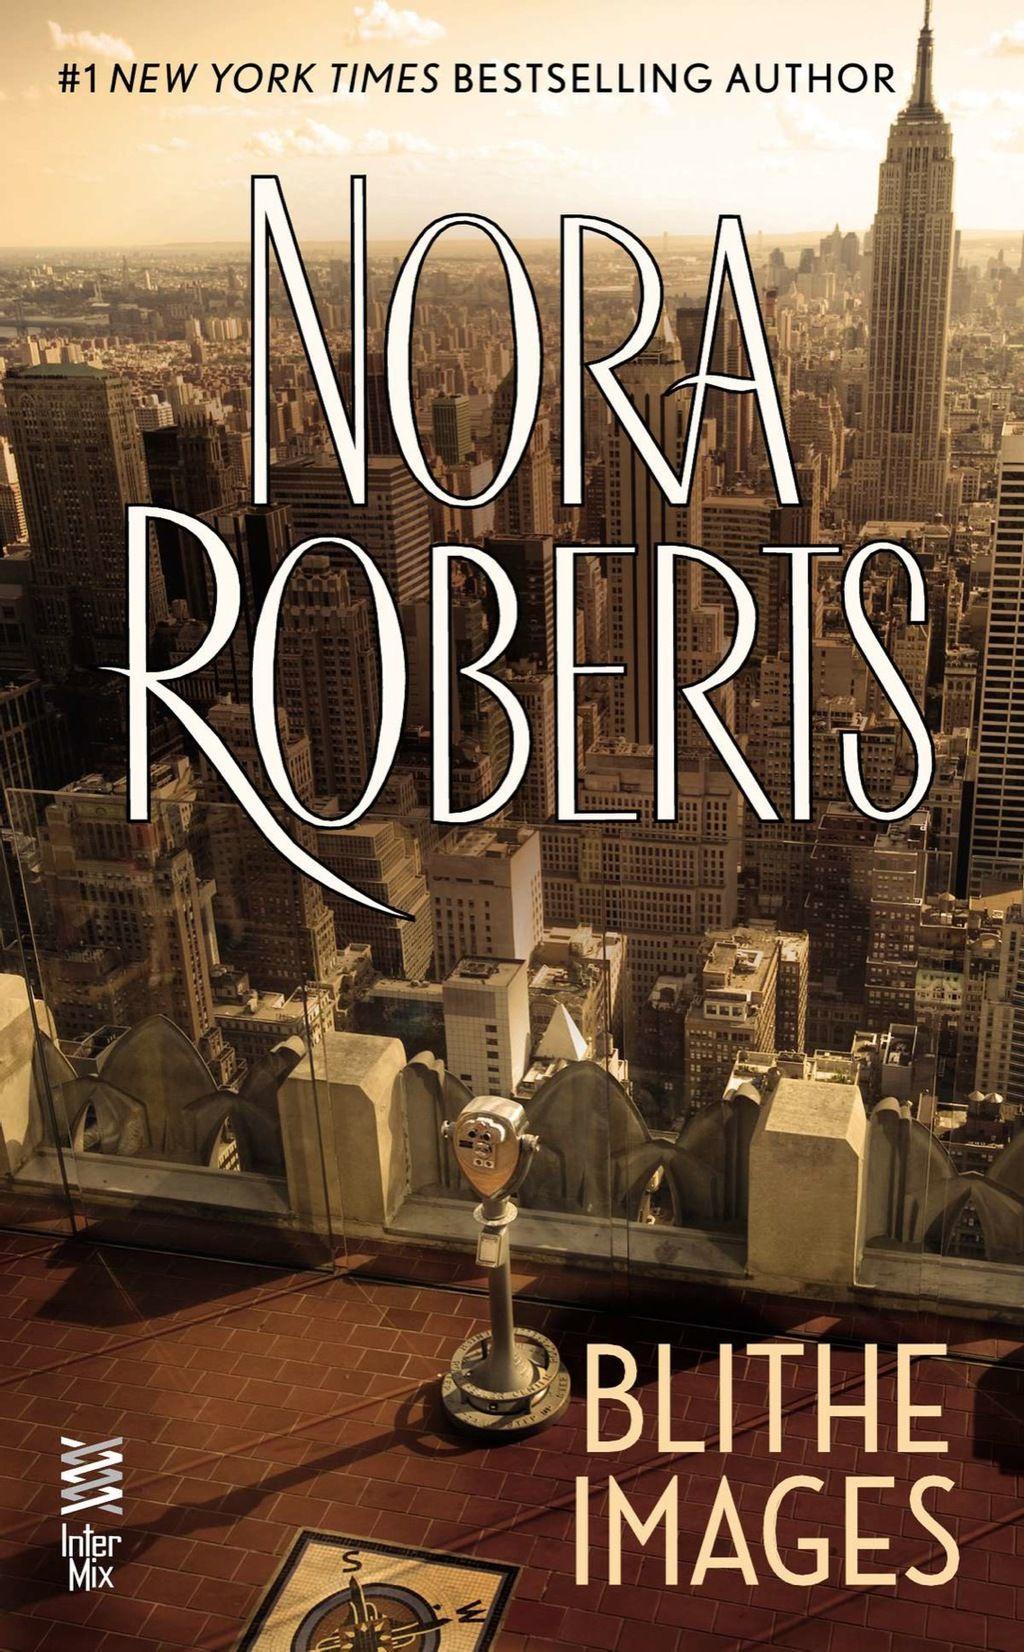 Blithe images ebook nora roberts nora roberts books